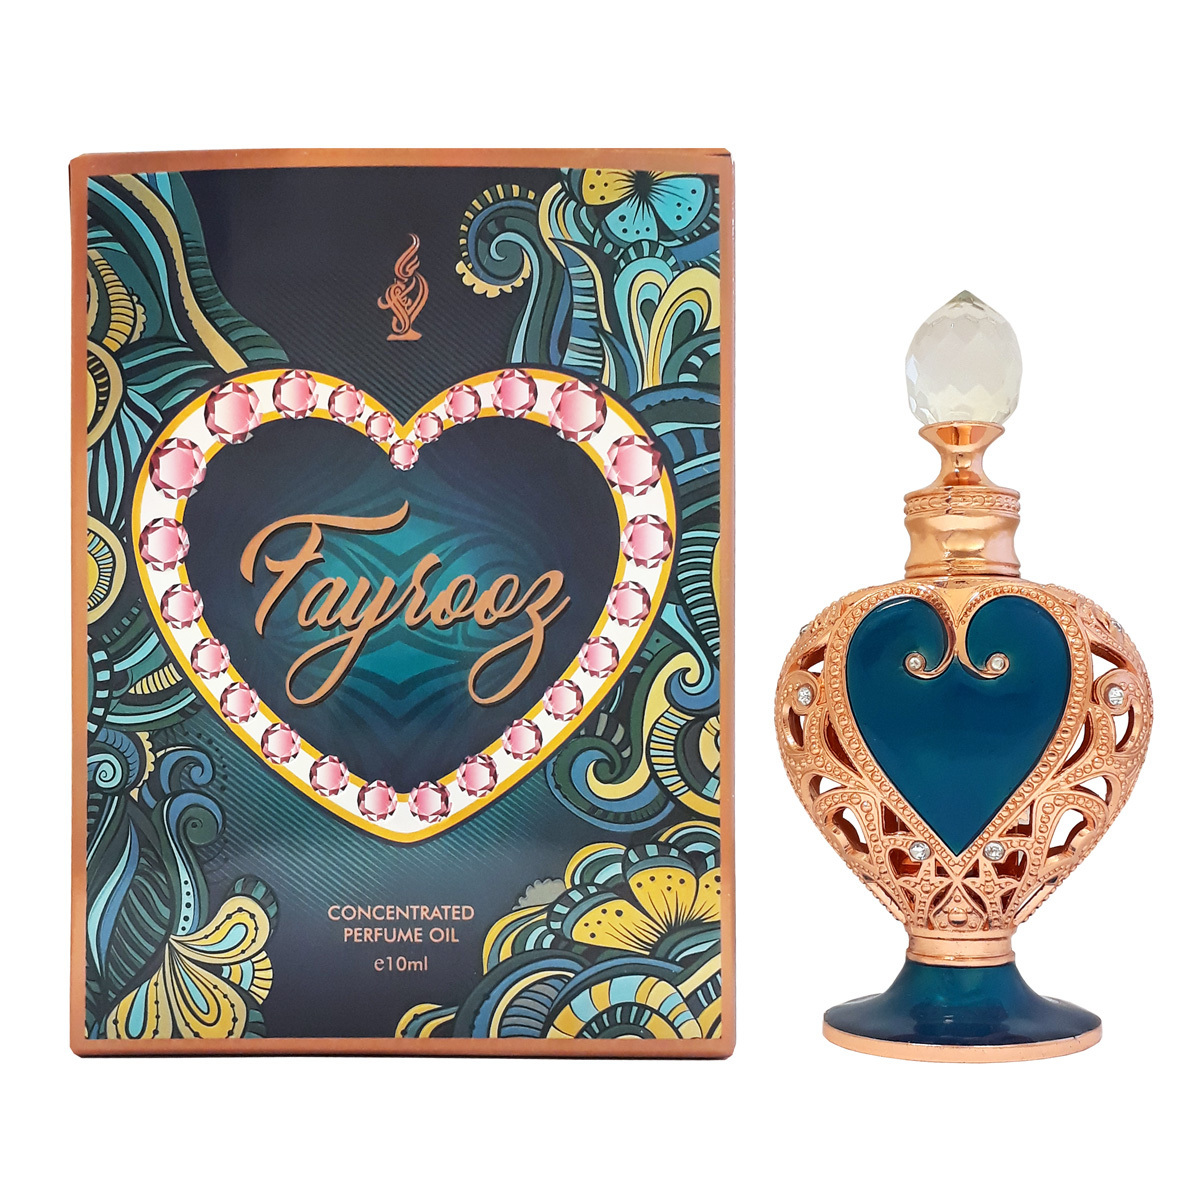 Пробник для Fayrooz  Файруз 1 мл арабские масляные духи от Халис Khalis Perfumes